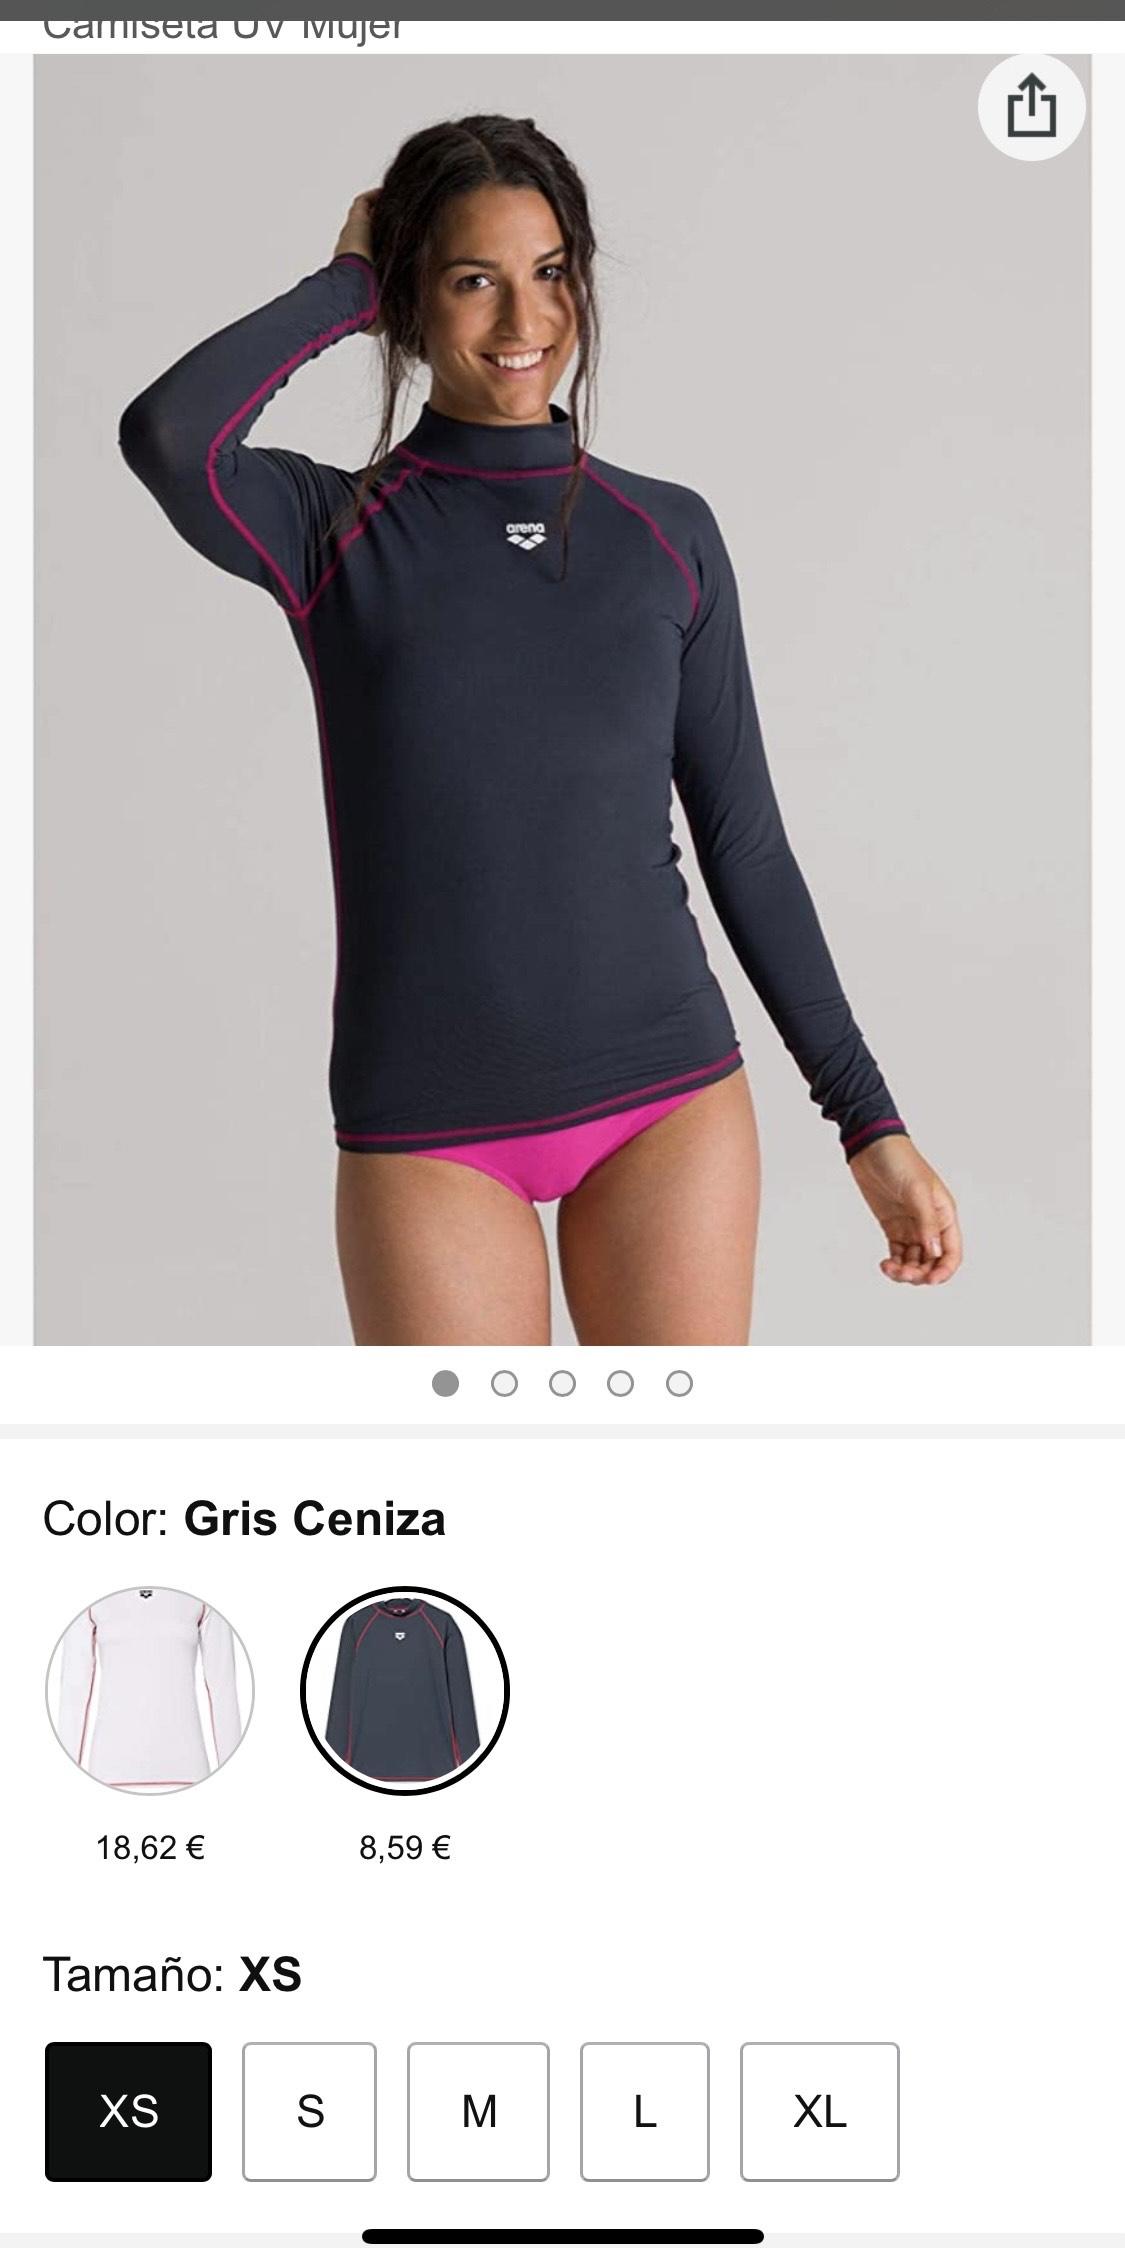 Tamaño: XS ARENA Camiseta UV Mujer